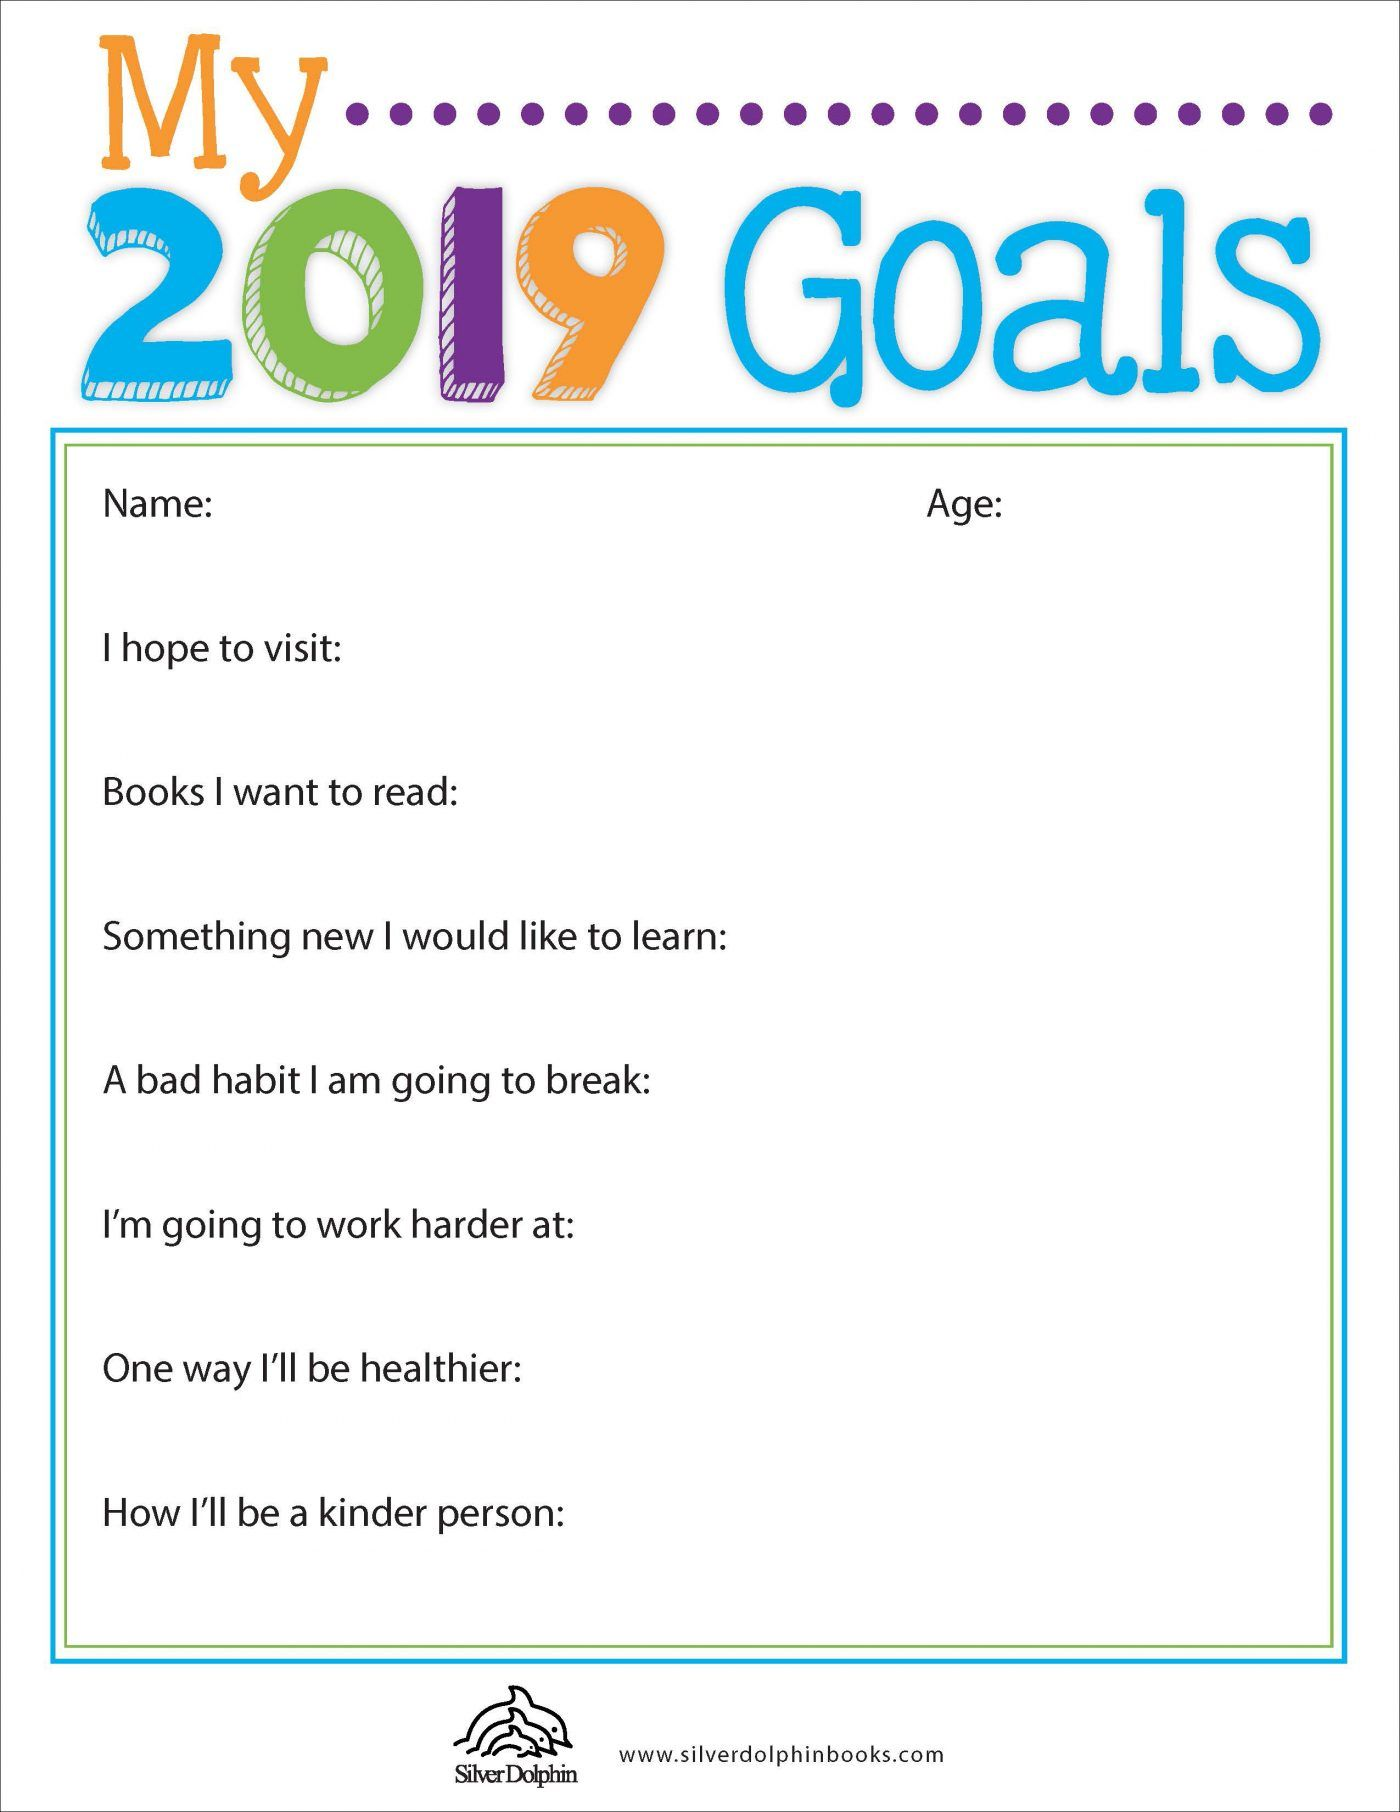 2019 Goals Downloadable Reading Worksheets Goals Worksheet Kindergarten Worksheets [ 1812 x 1400 Pixel ]